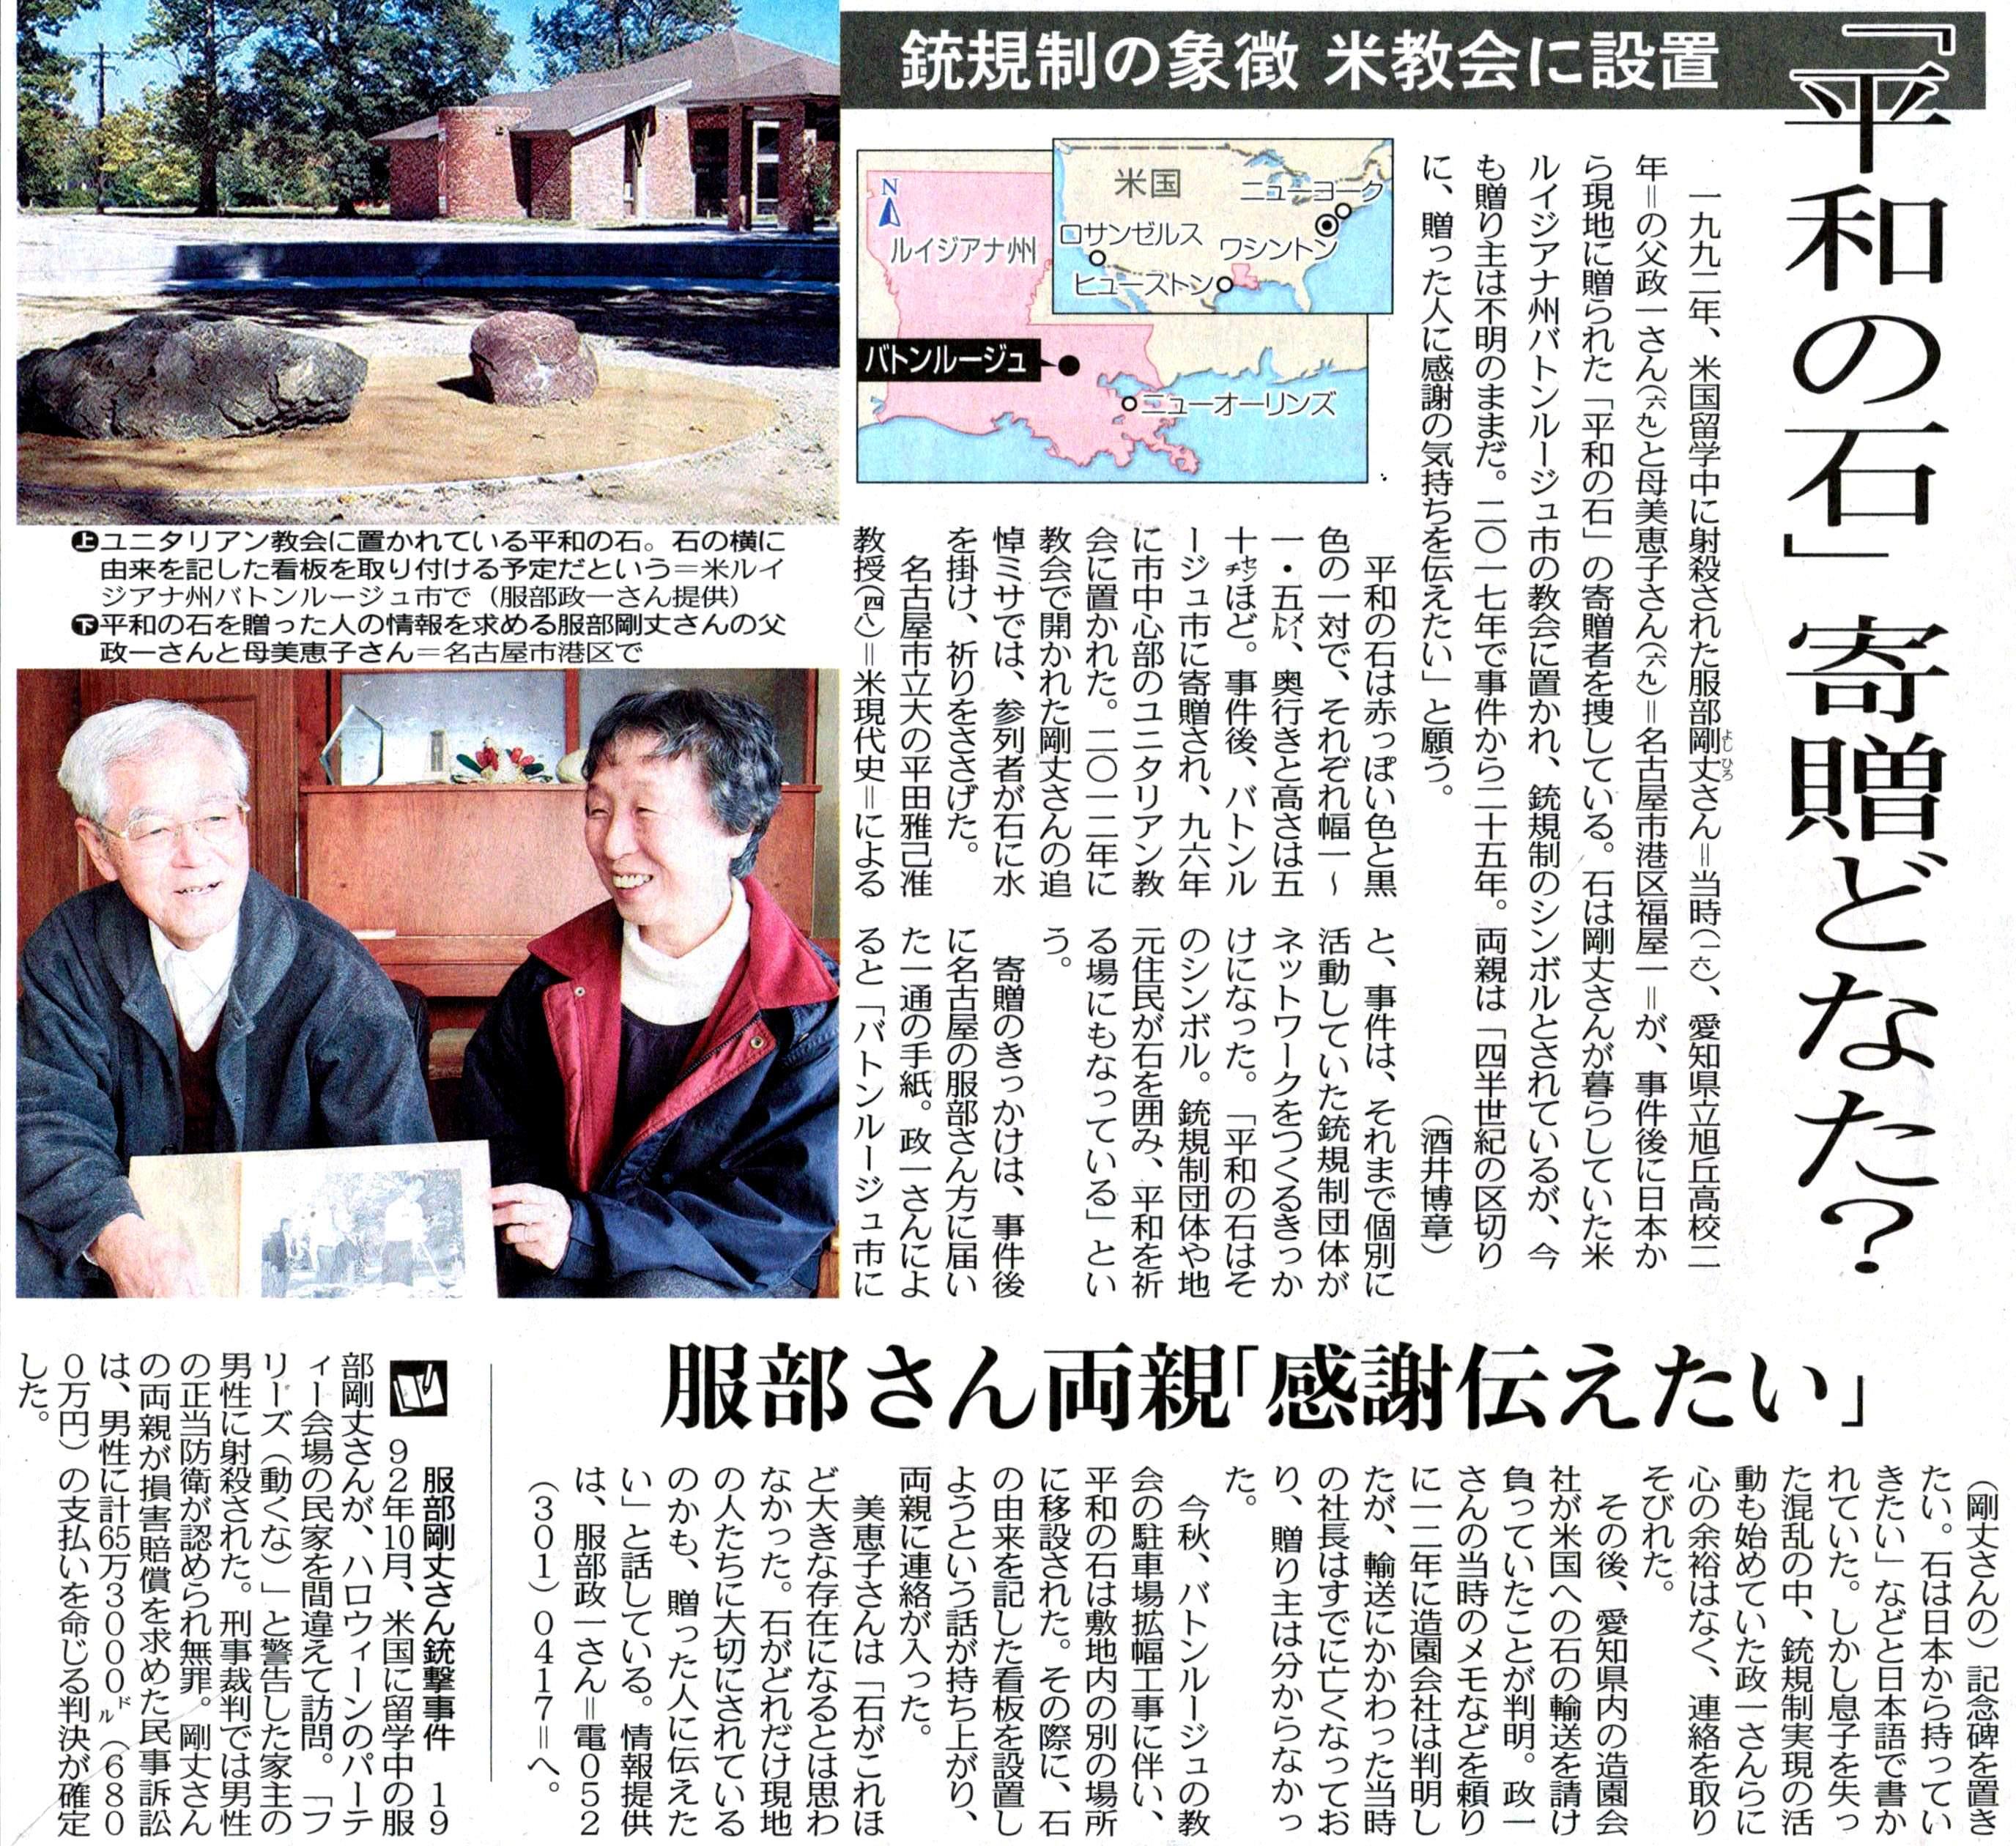 http://img.atwikiimg.com/www45.atwiki.jp/jippensha/attach/57/5092/83_hattori%20yosihiro.jpg